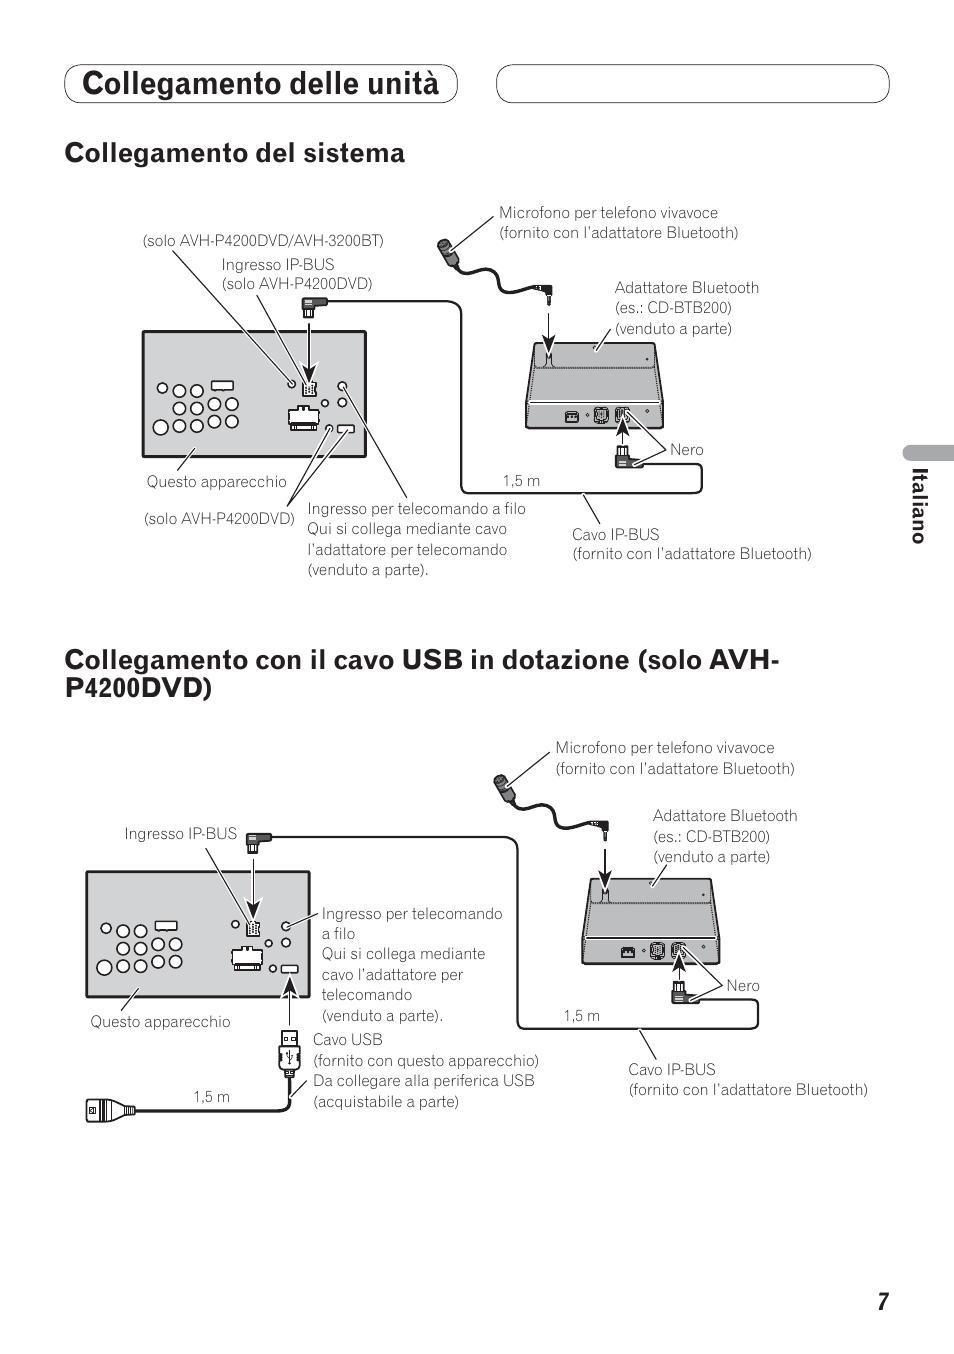 hight resolution of solo avh p4200dvd collegamento delle unit pioneer avh p4200dvd pioneer bypass parking brake diagram wiring diagram for pioneer avh p4200dvd